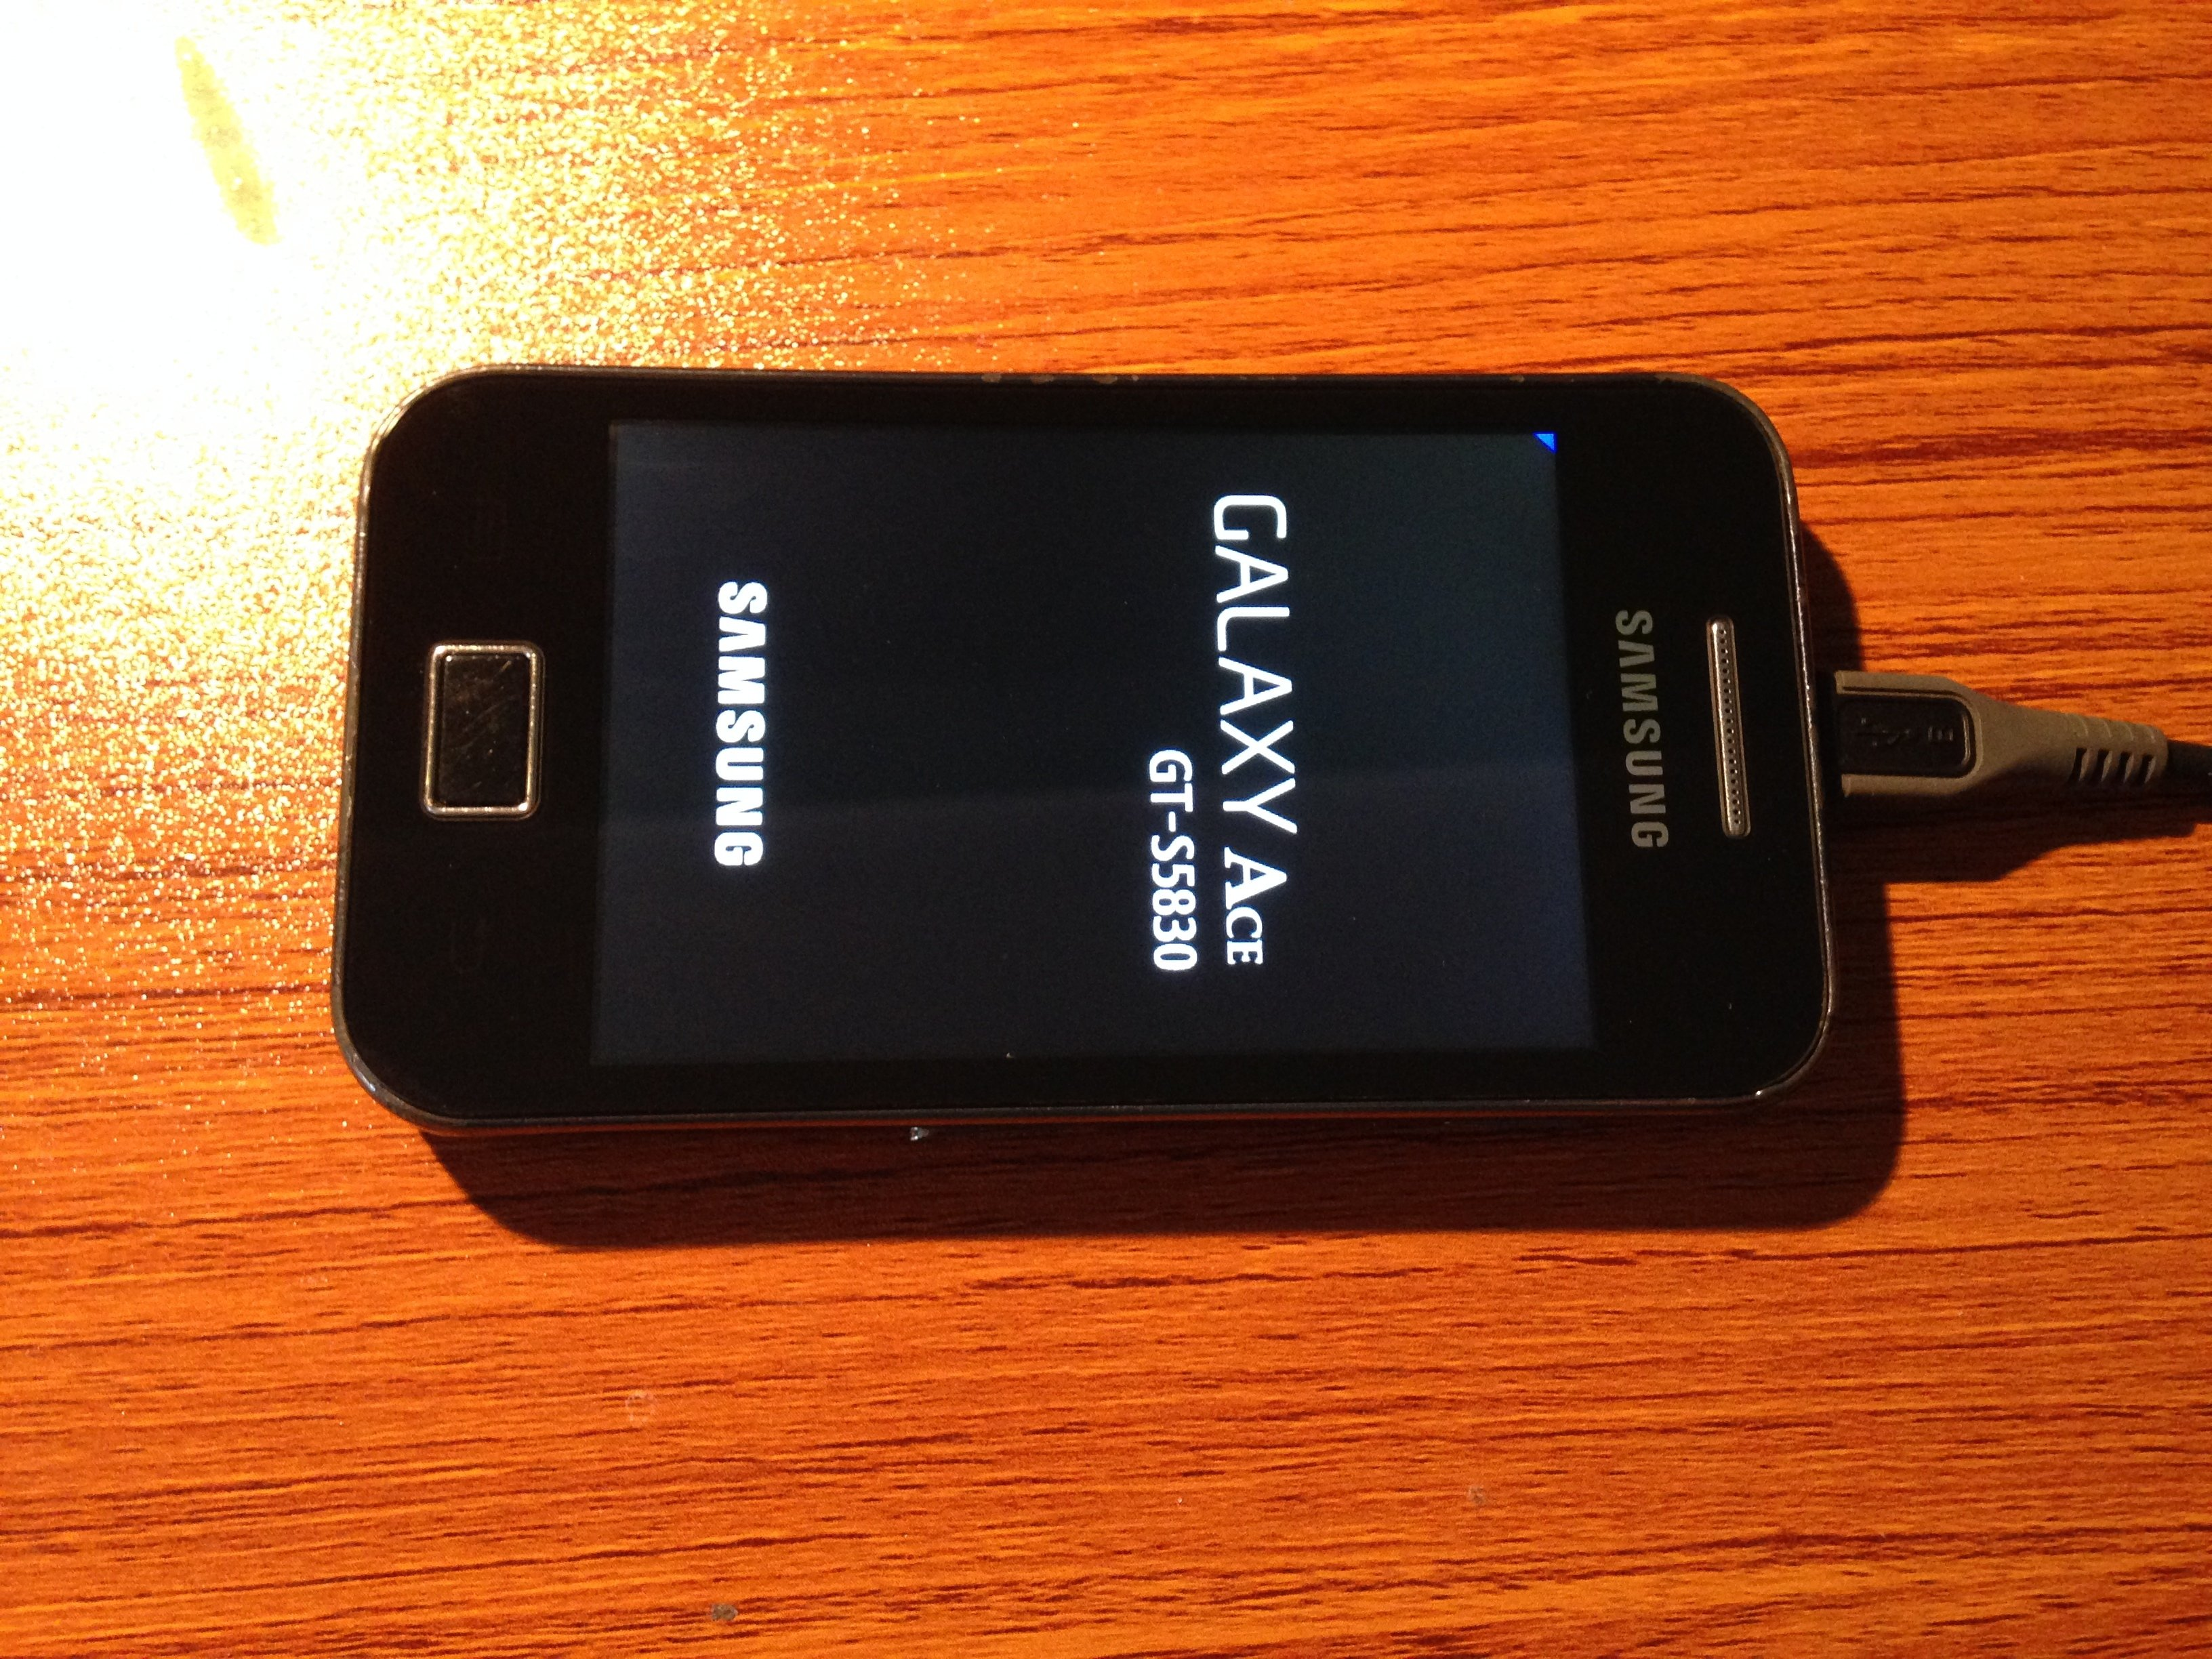 Samsung Galaxy Ace Teardown - iFixit